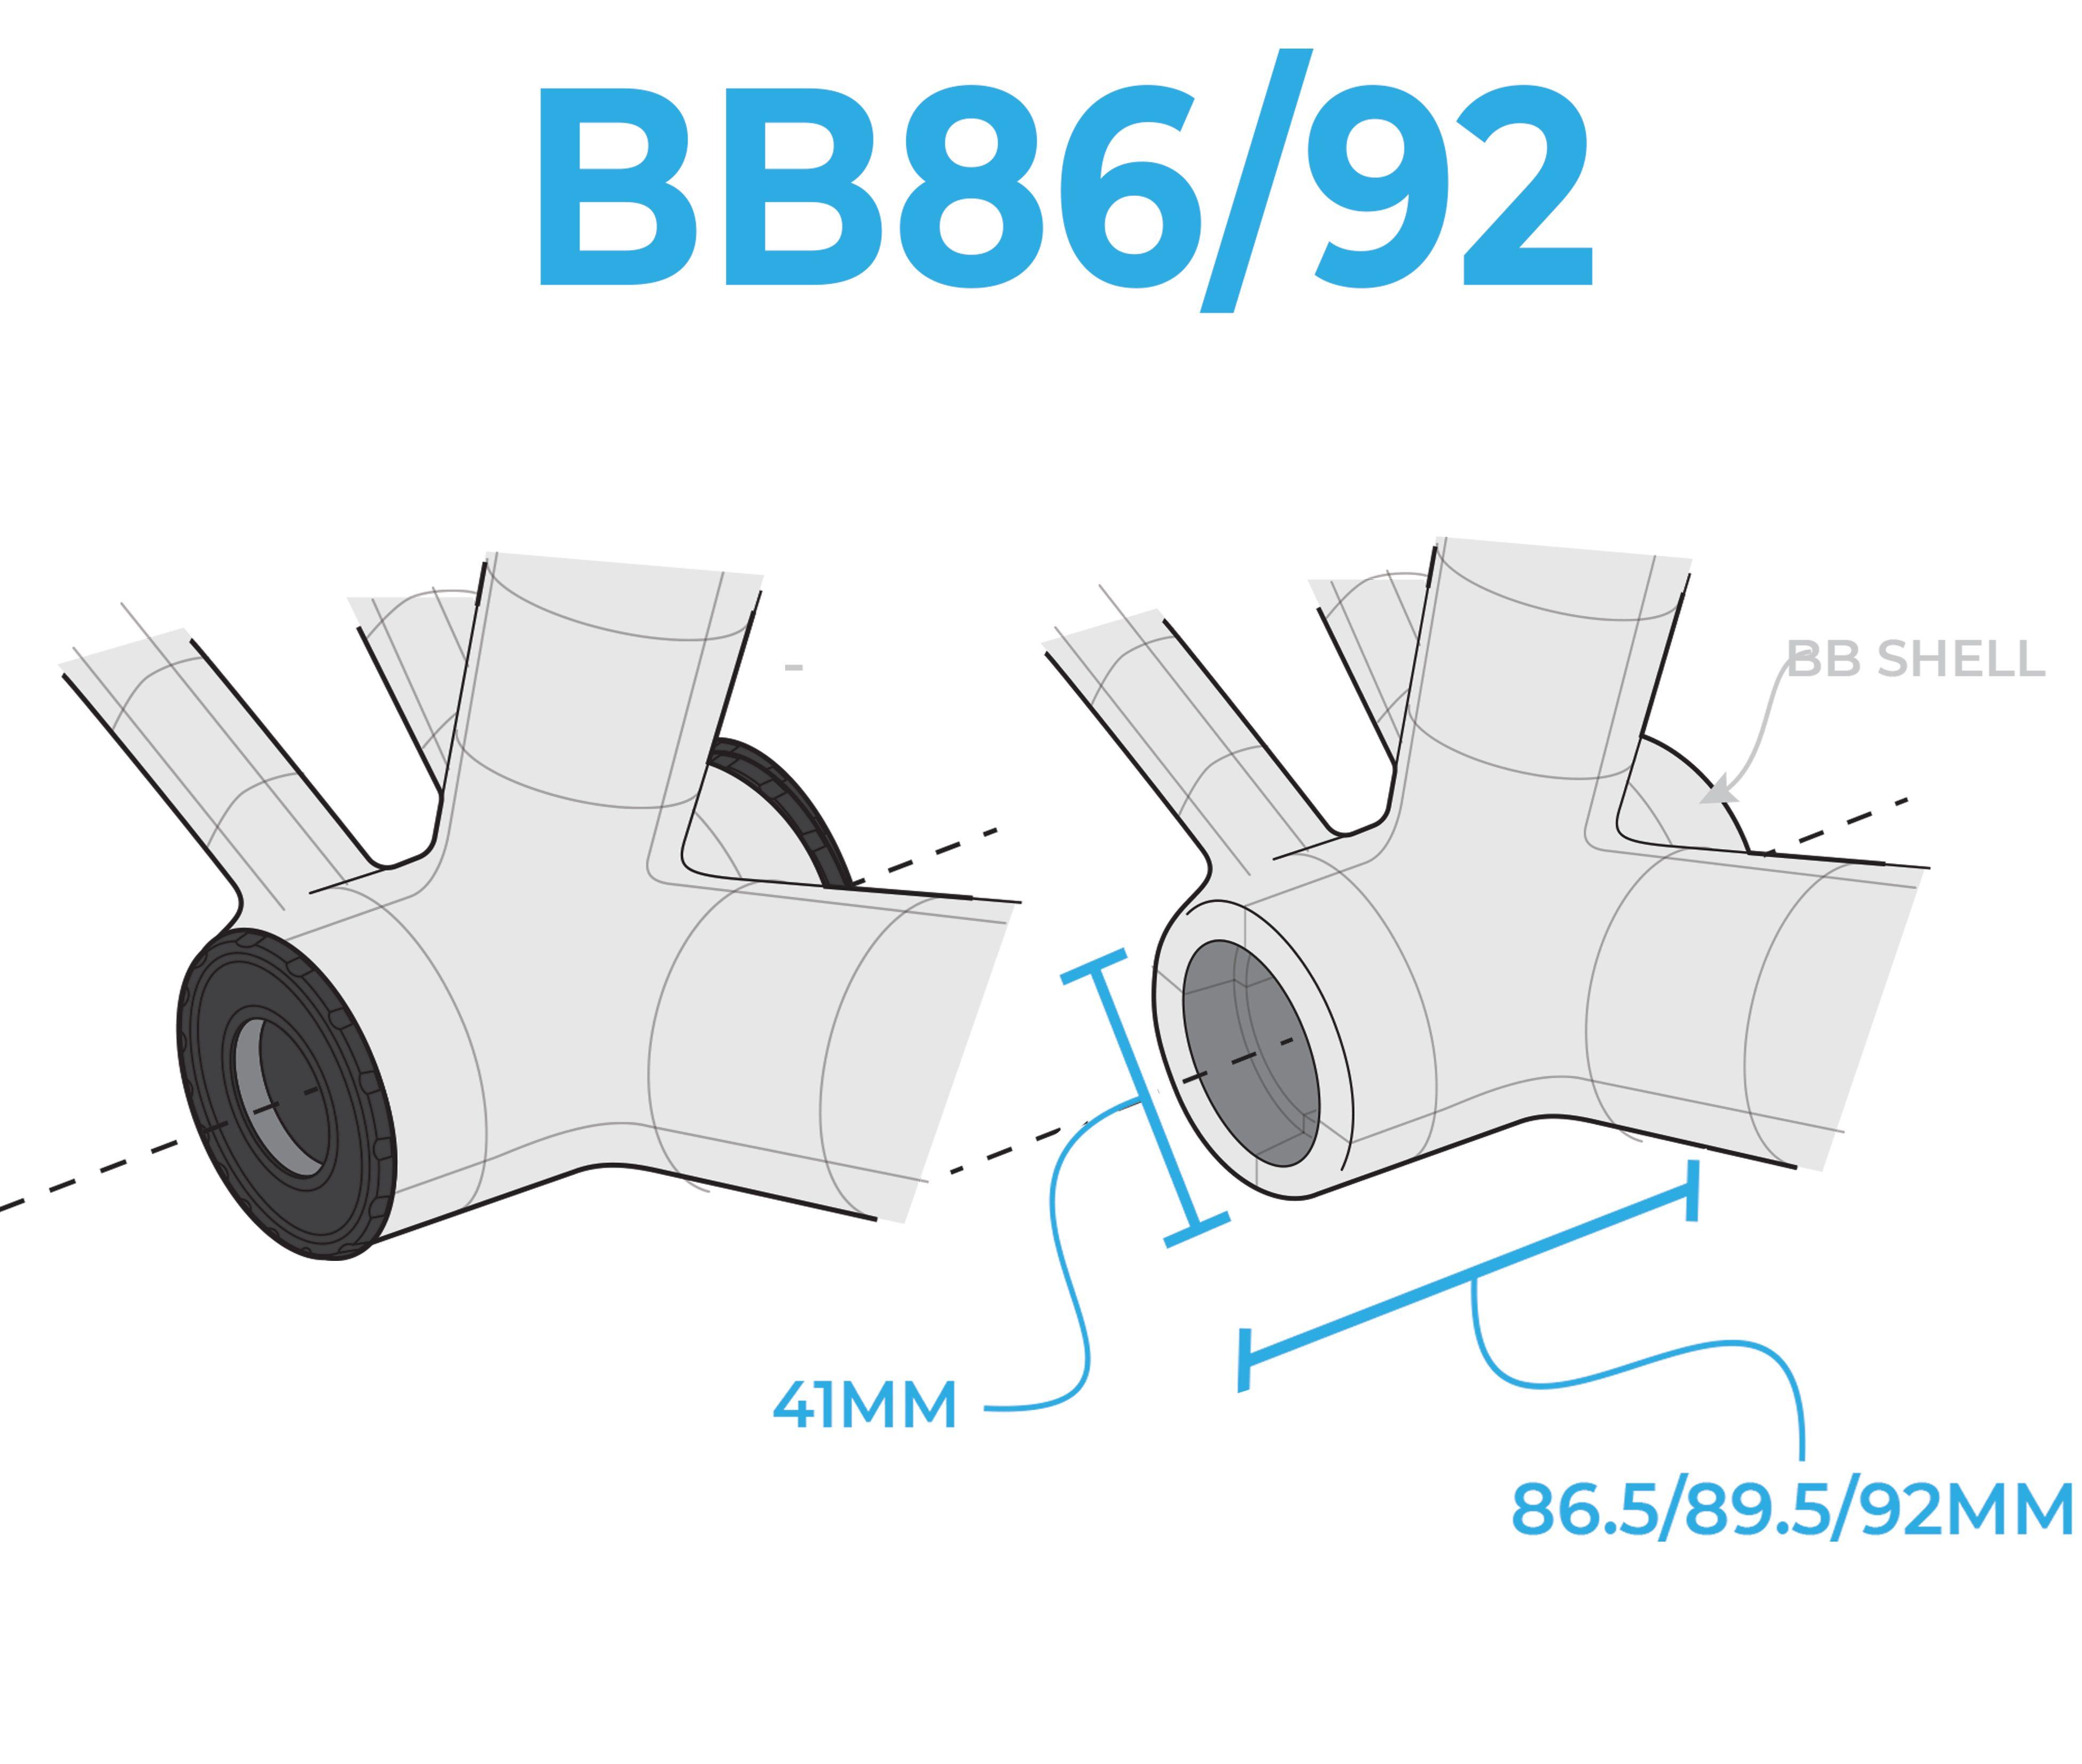 BB86/92